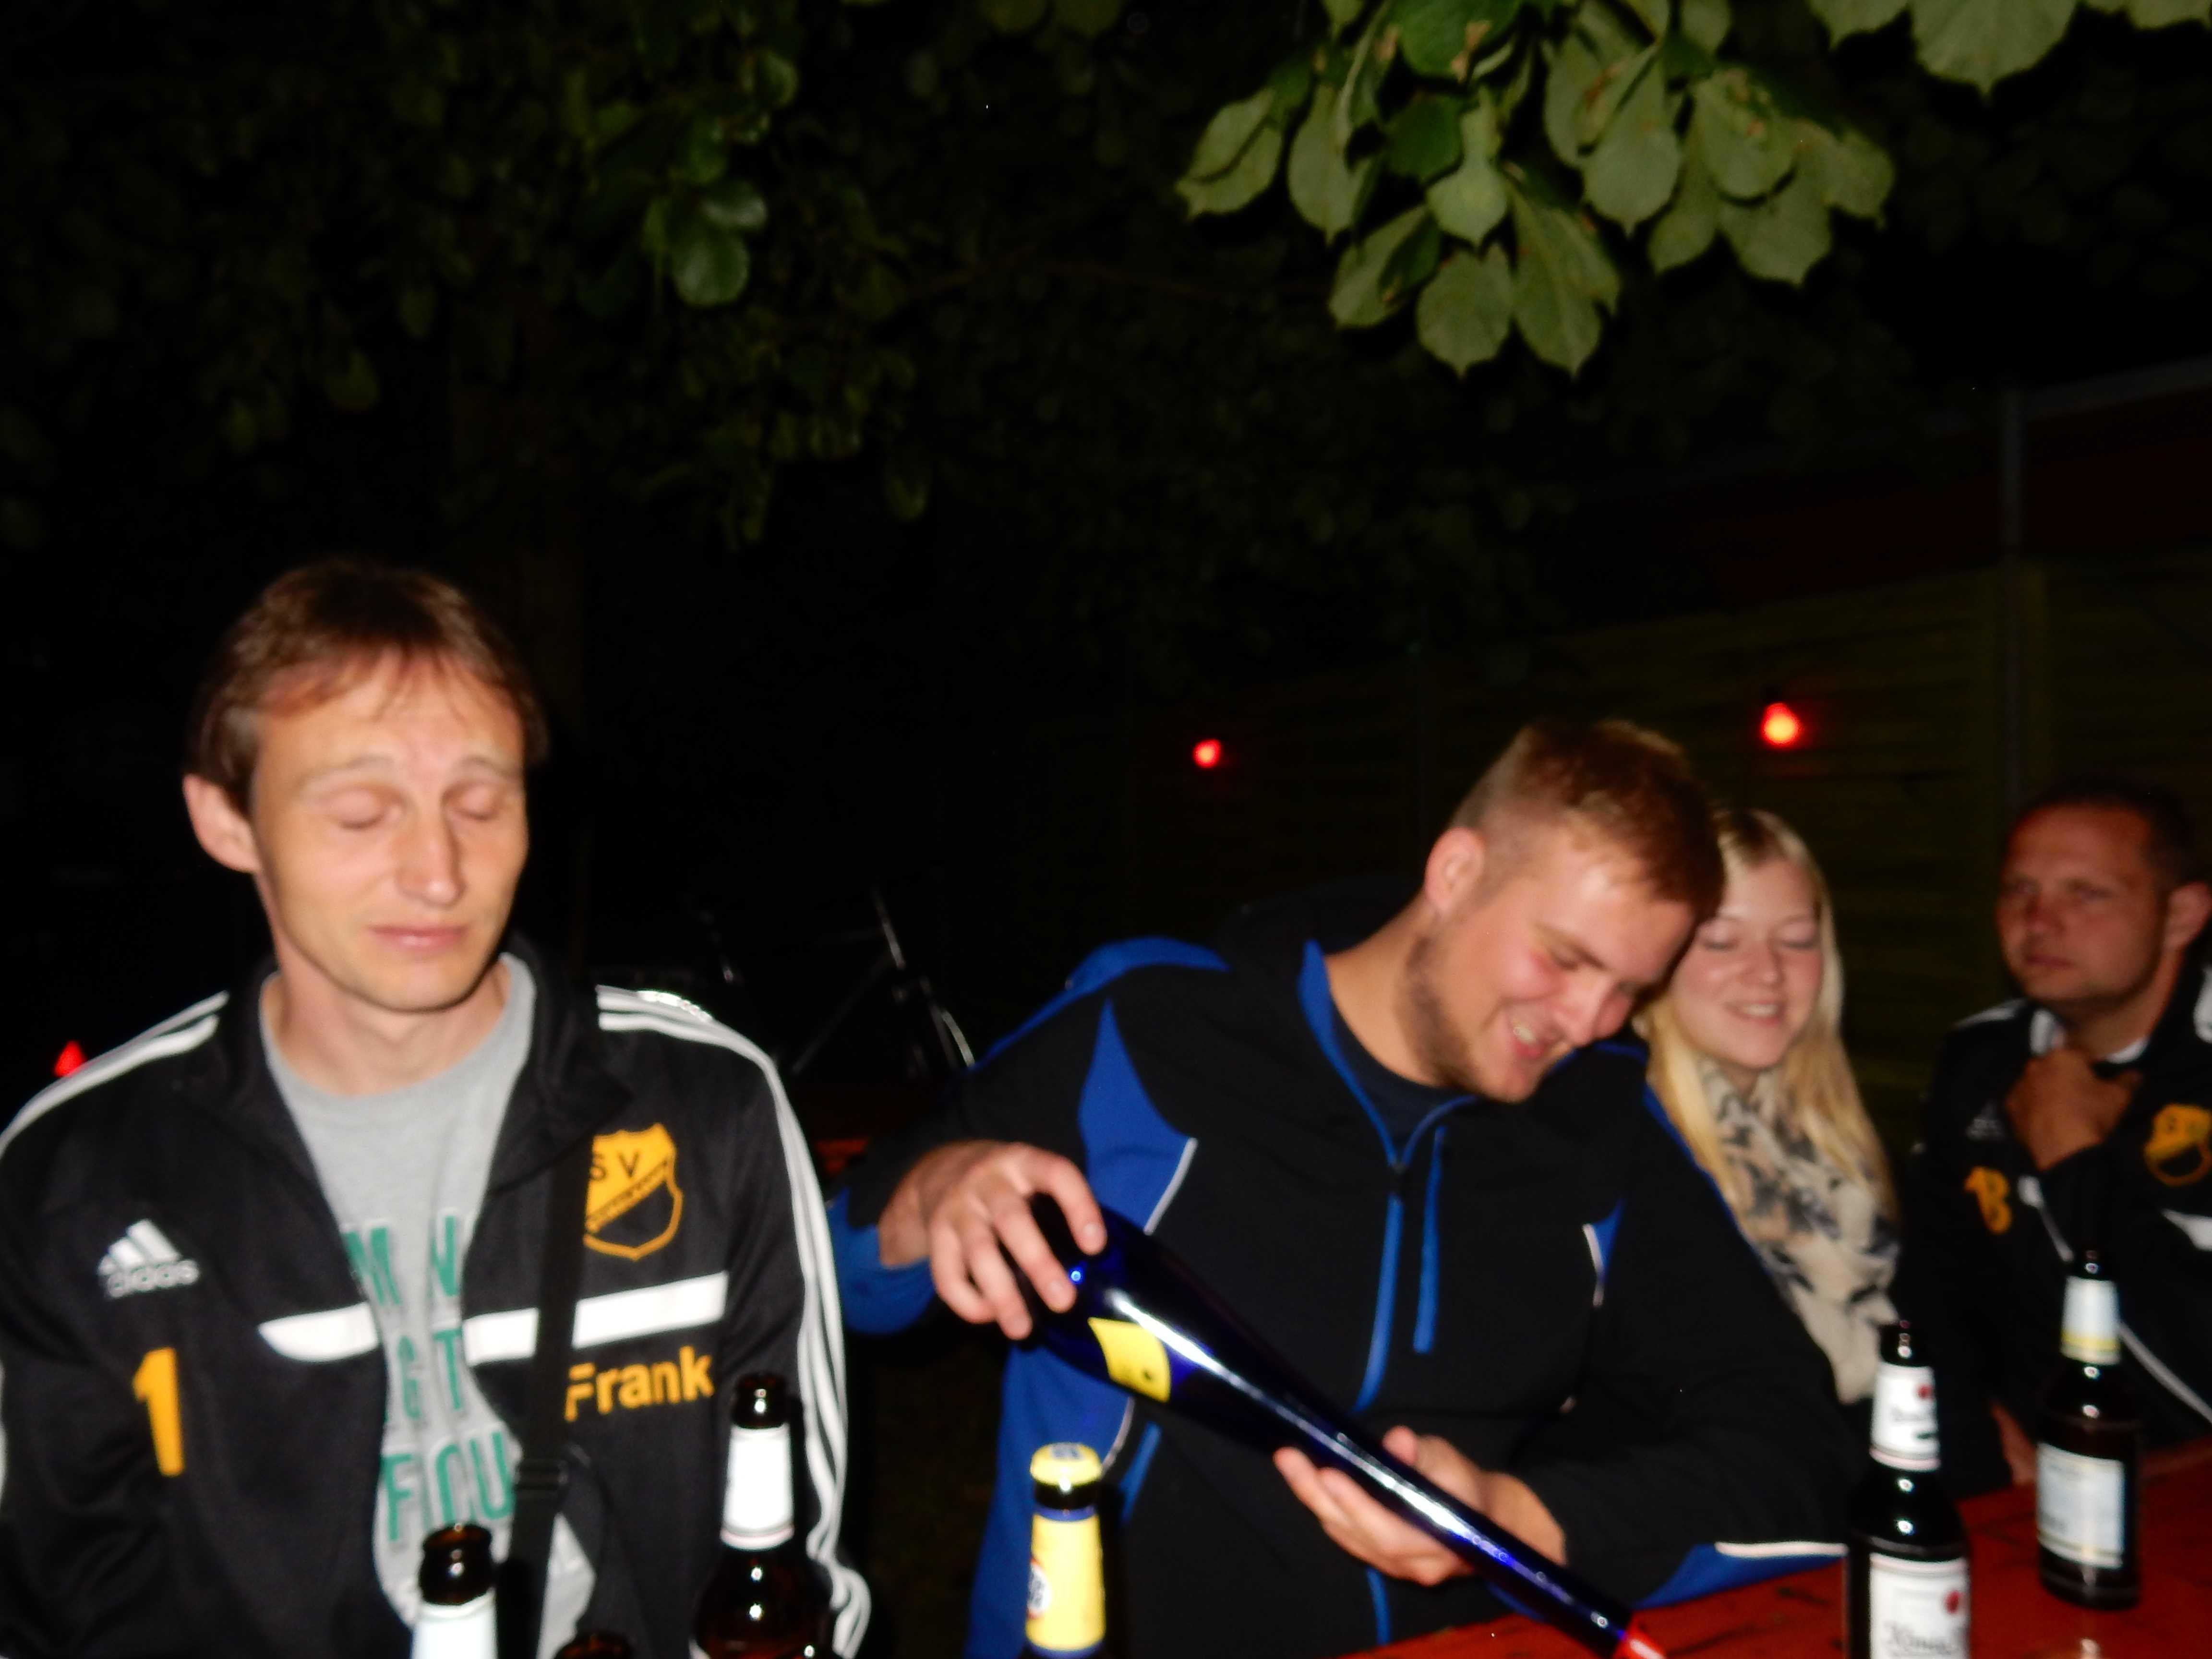 2016-07-29 Sportwoche - erster Freitag (143)